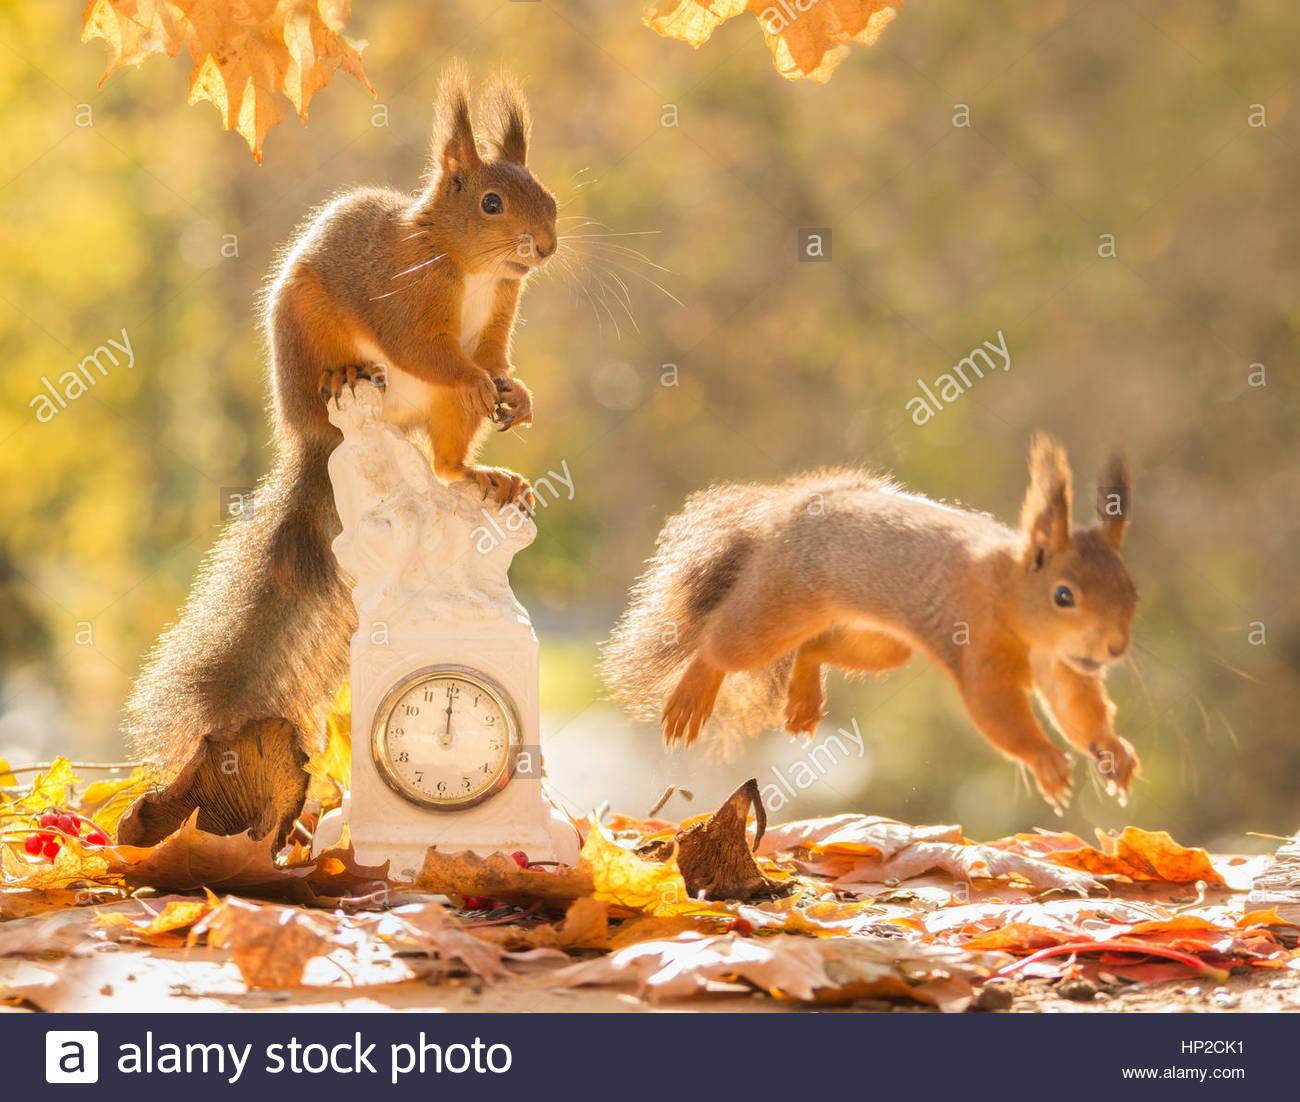 Squirrel Running Away Stockfotos & Squirrel Running Away Bilder ...